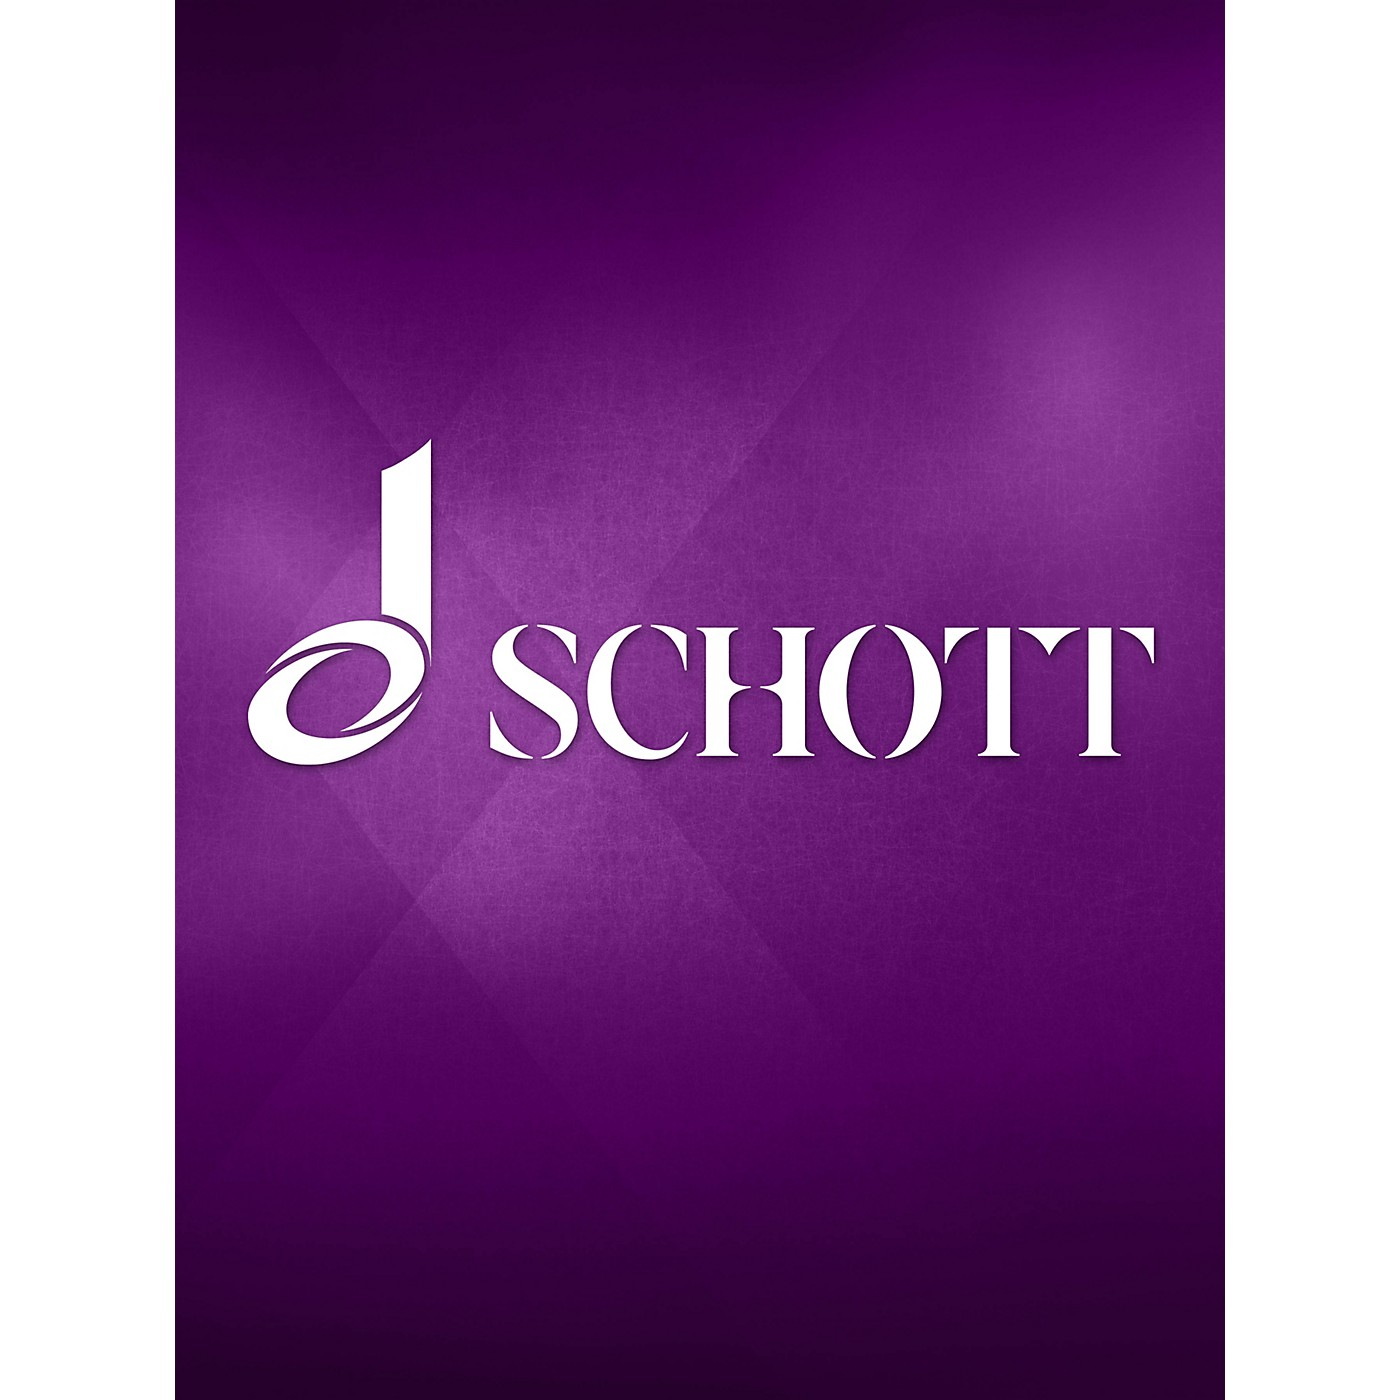 Eulenburg Cantata No. 6, Feria 2 Paschatos Schott Composed by Johann Sebastian Bach Arranged by Hans Grischkat thumbnail